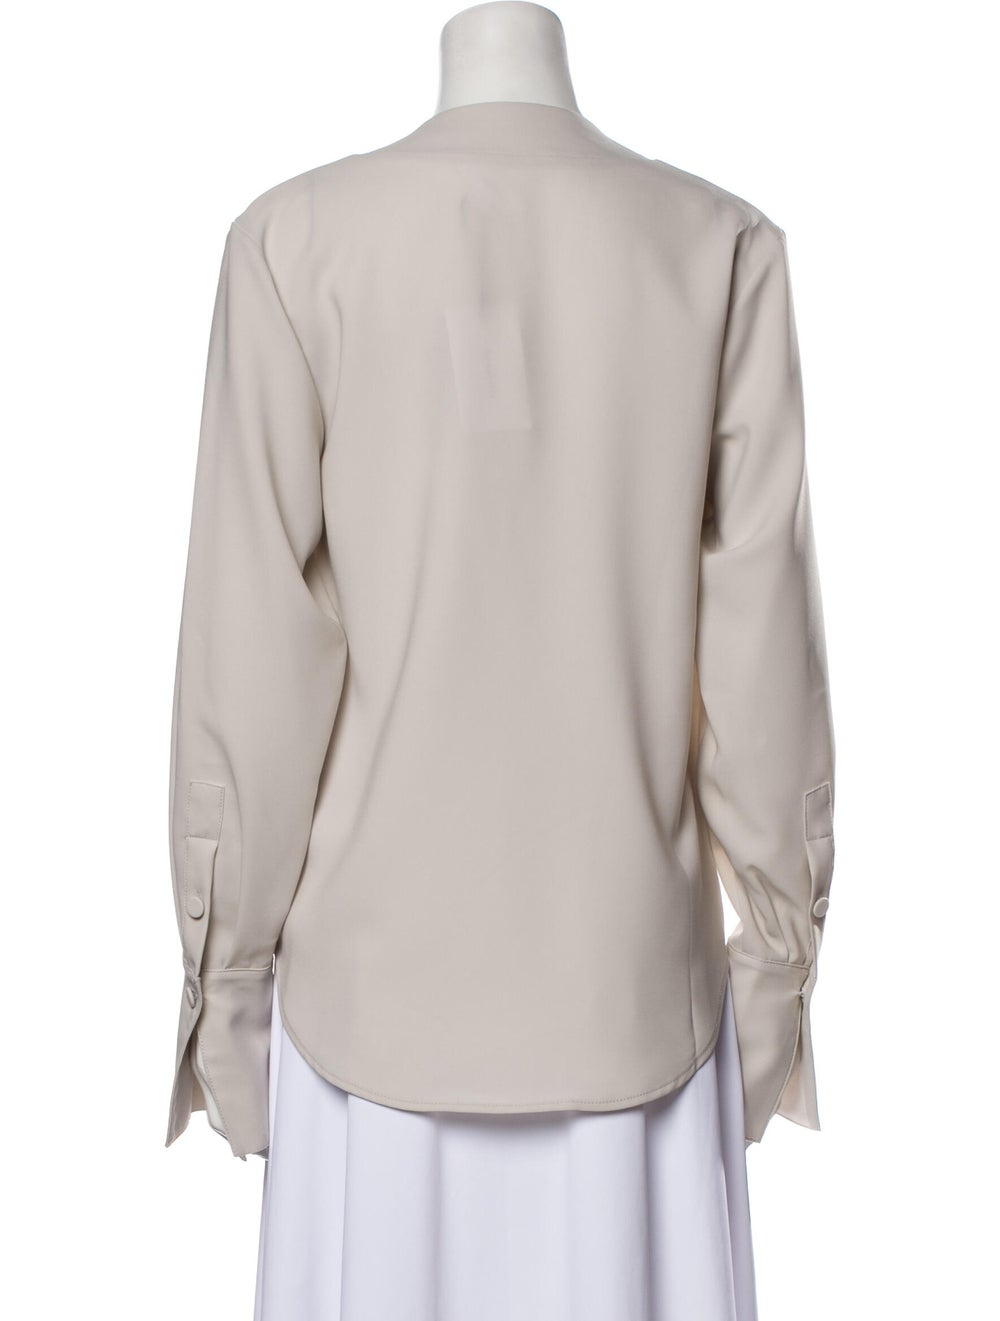 Beaufille V-Neck Long Sleeve Blouse Grey - image 3